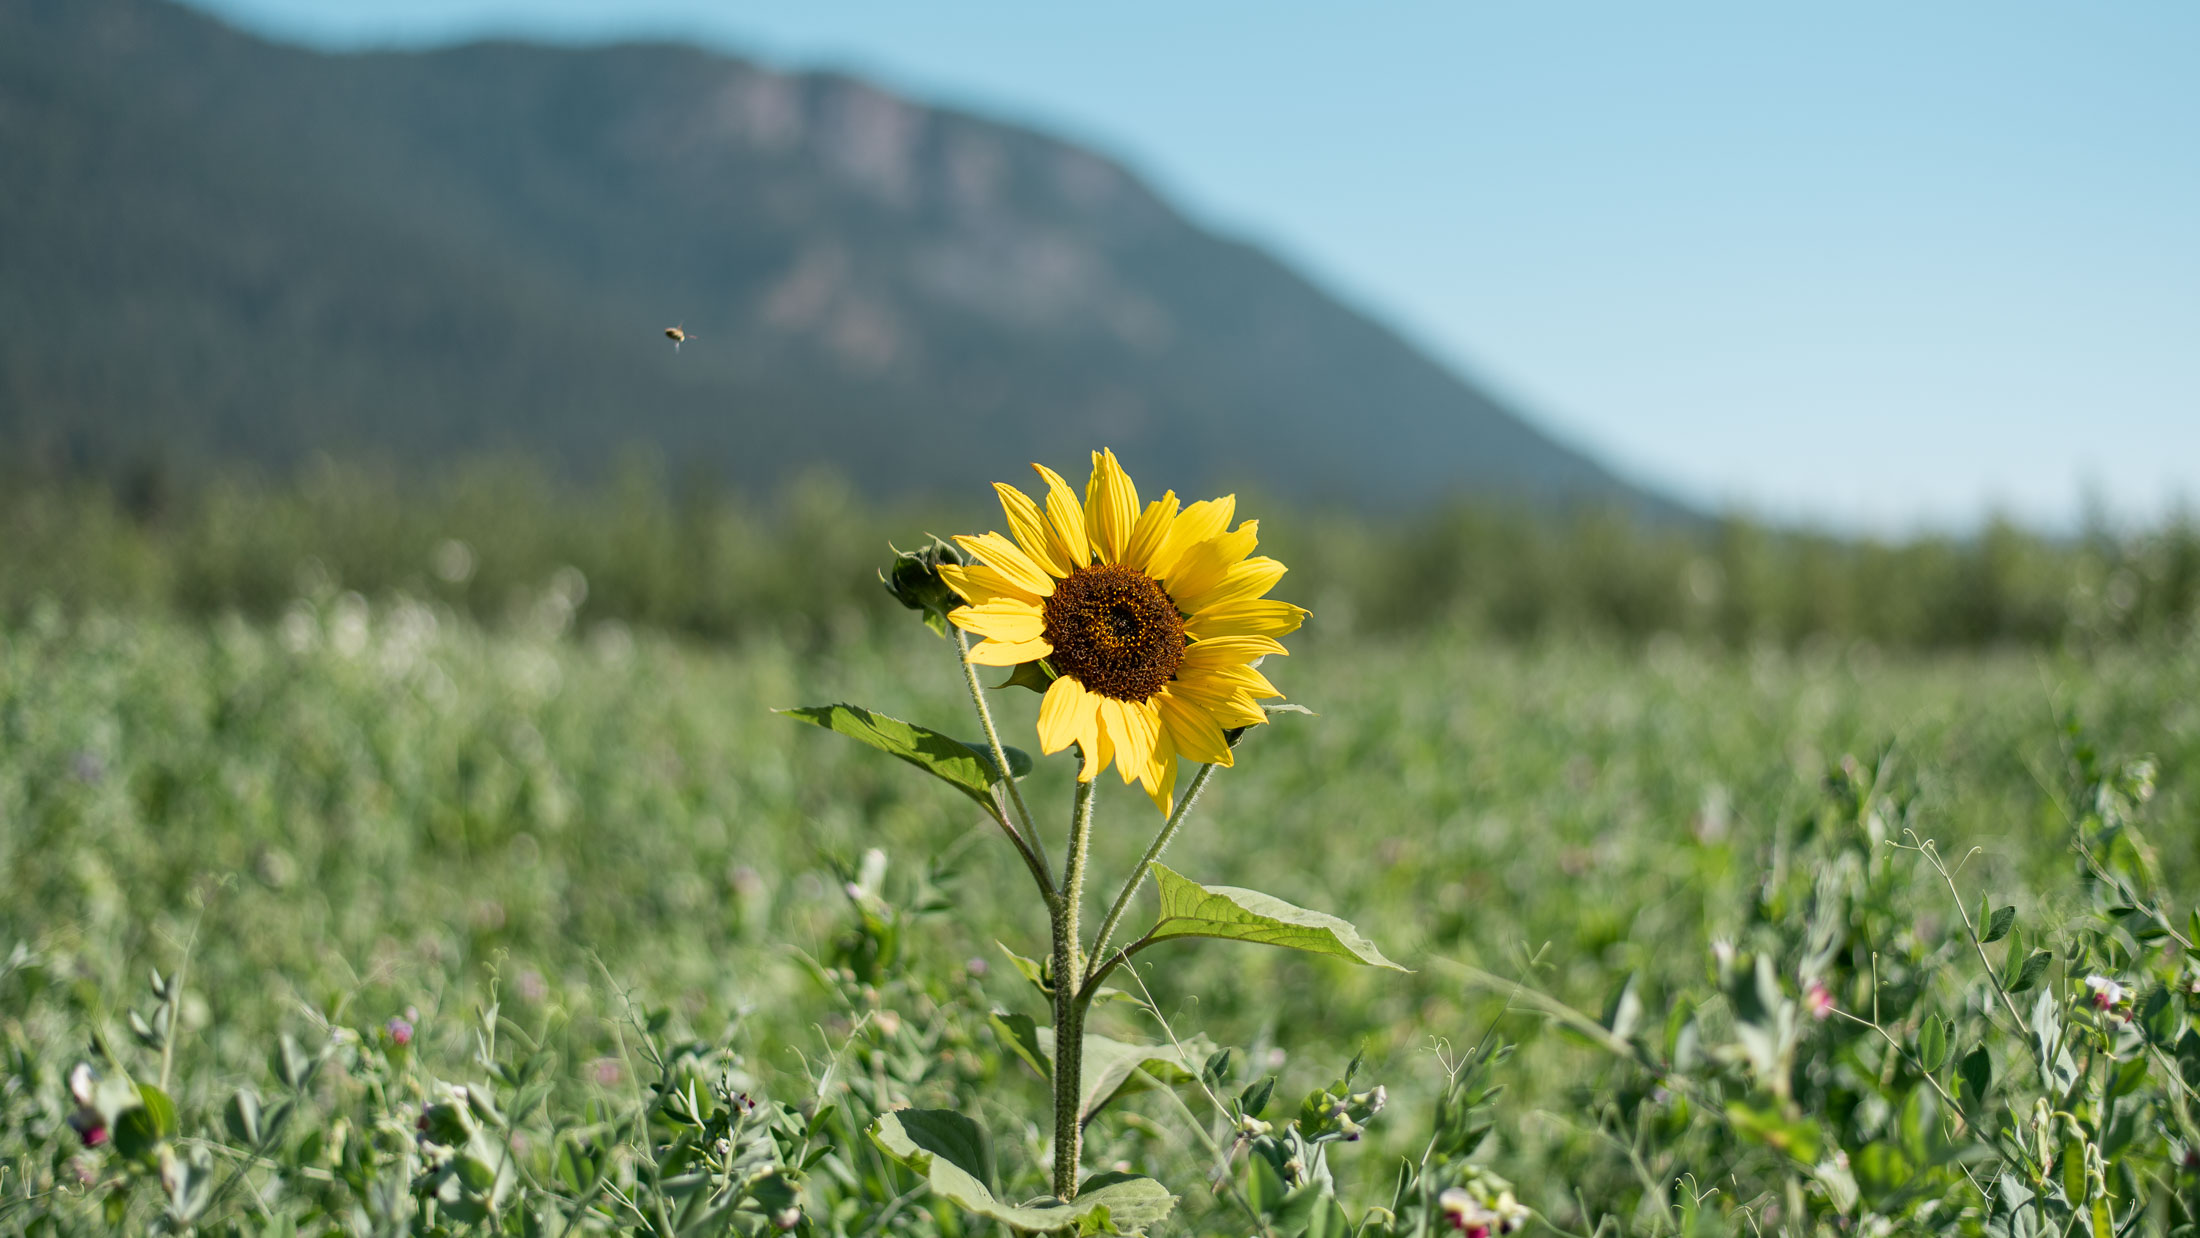 072820_sunflower-6